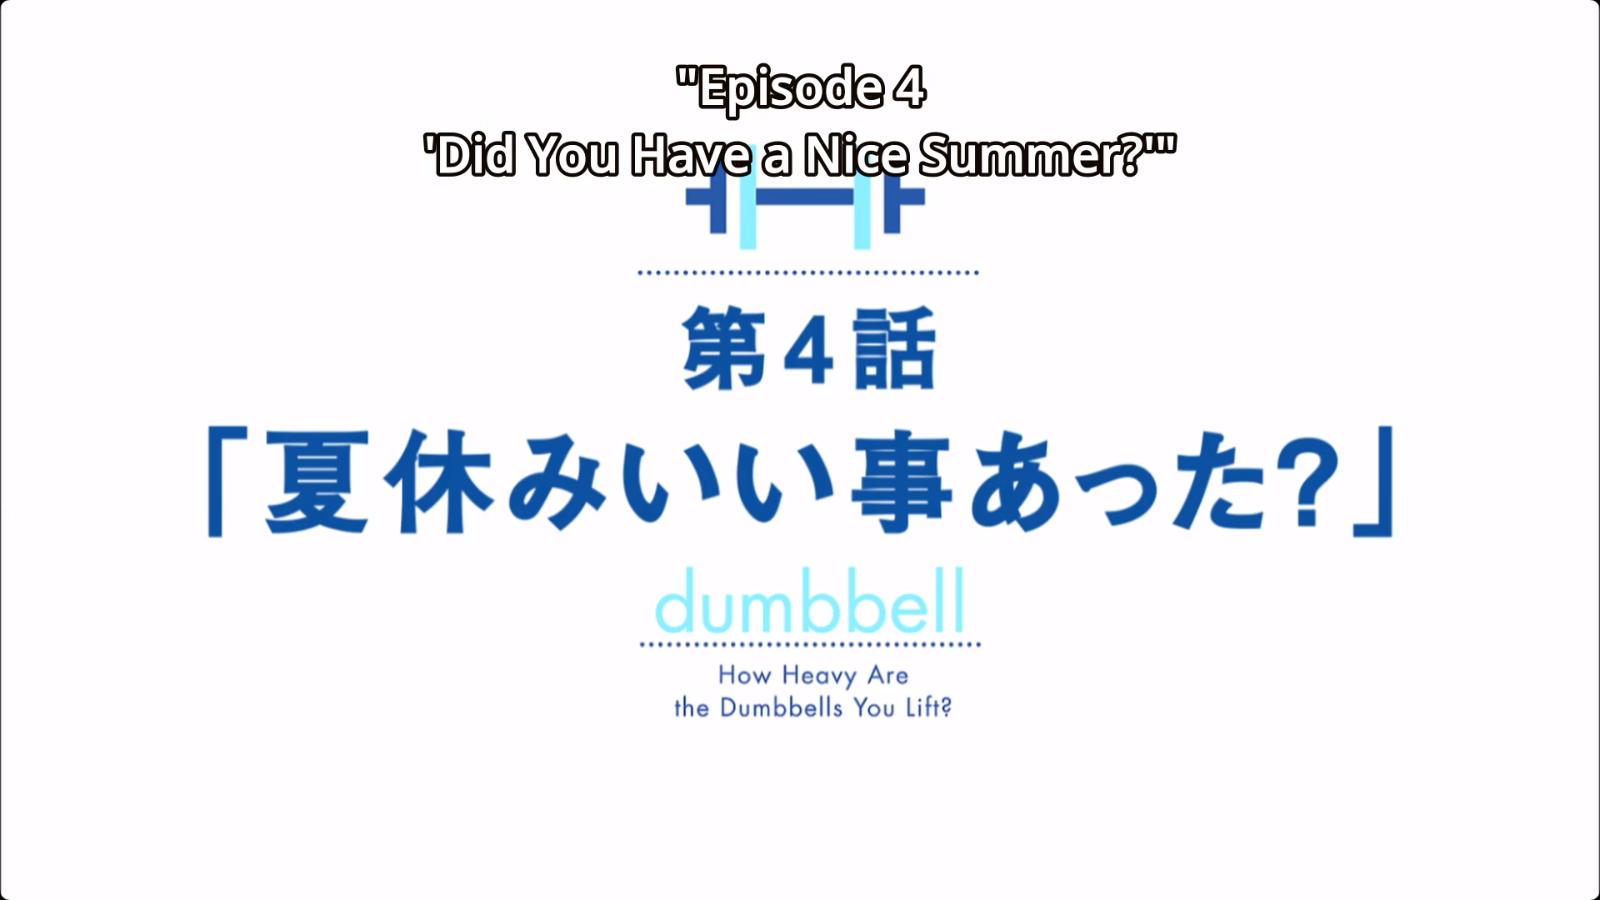 Did You Have A Nice Summer Dumbbell Nan Kilo Moteru Wiki Fandom